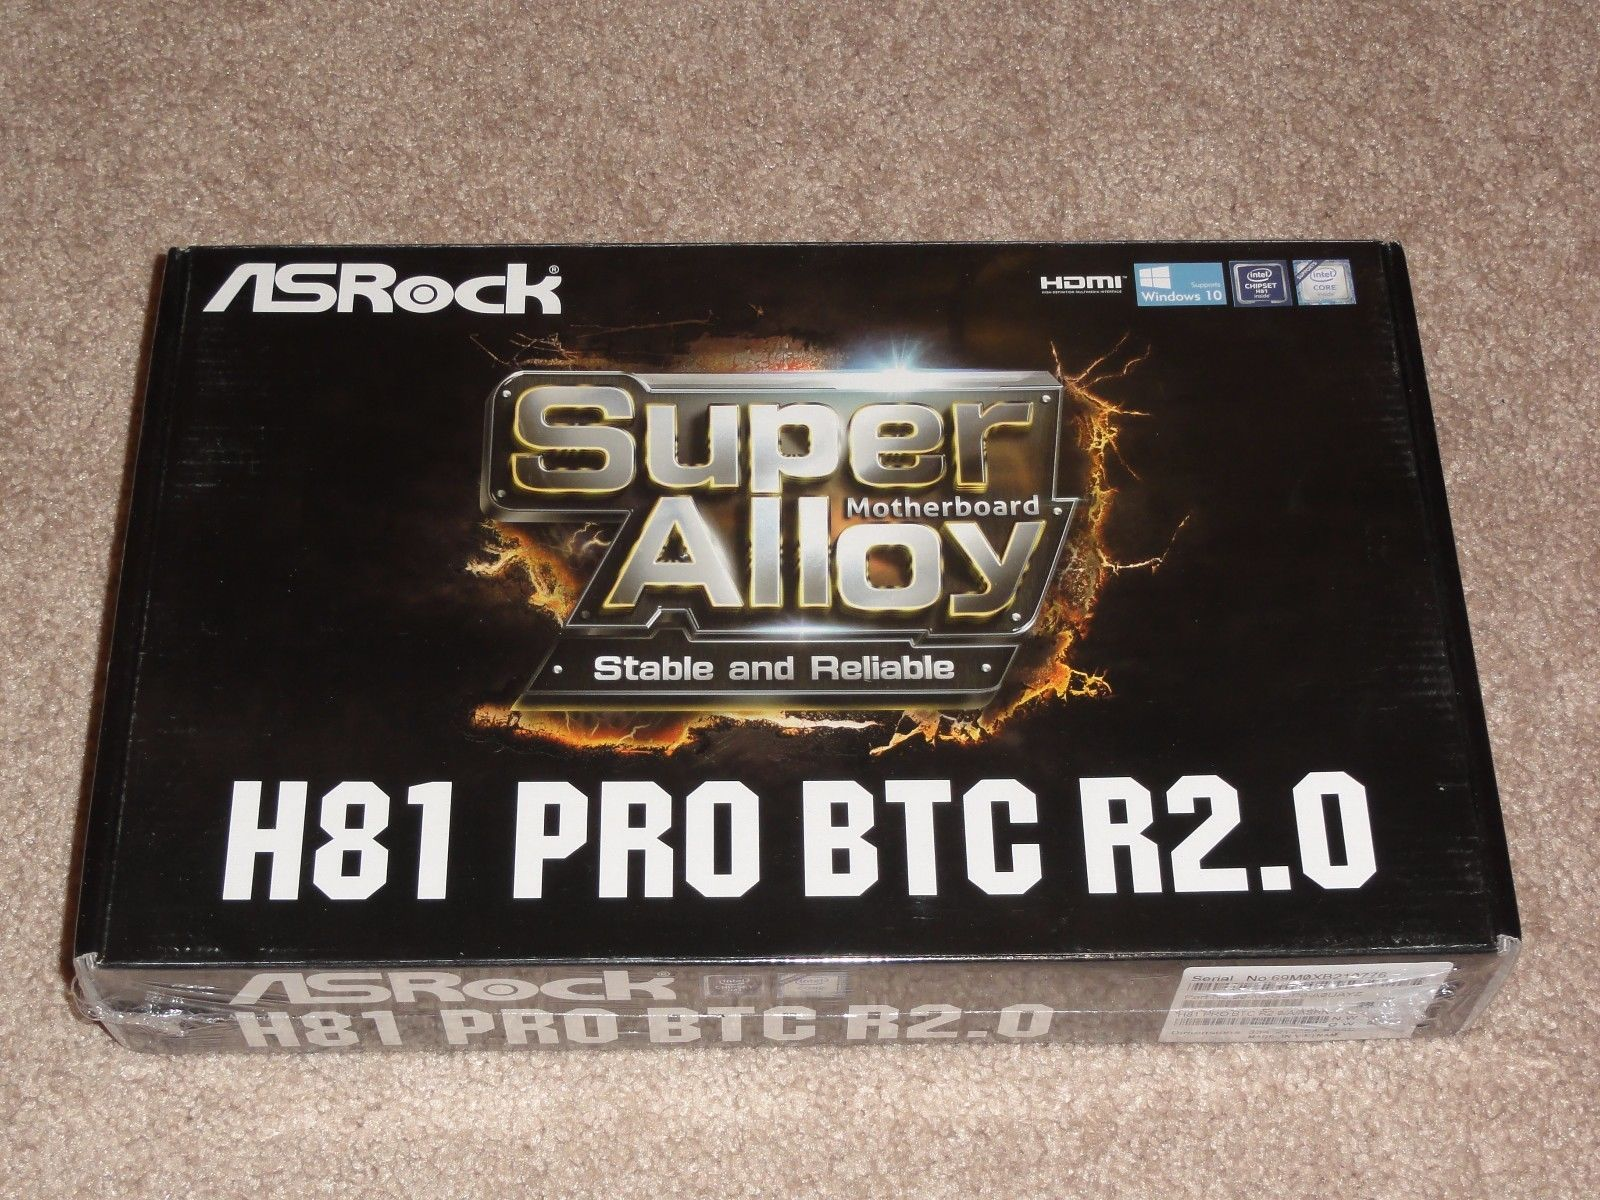 Item Specifics Condition New A B Pinterest Motherboard Biostar Tb250 Btc Lga 1151 Bitcoin Mining Description Asrock Pro 1150 Intel Ethereum Brand In Box